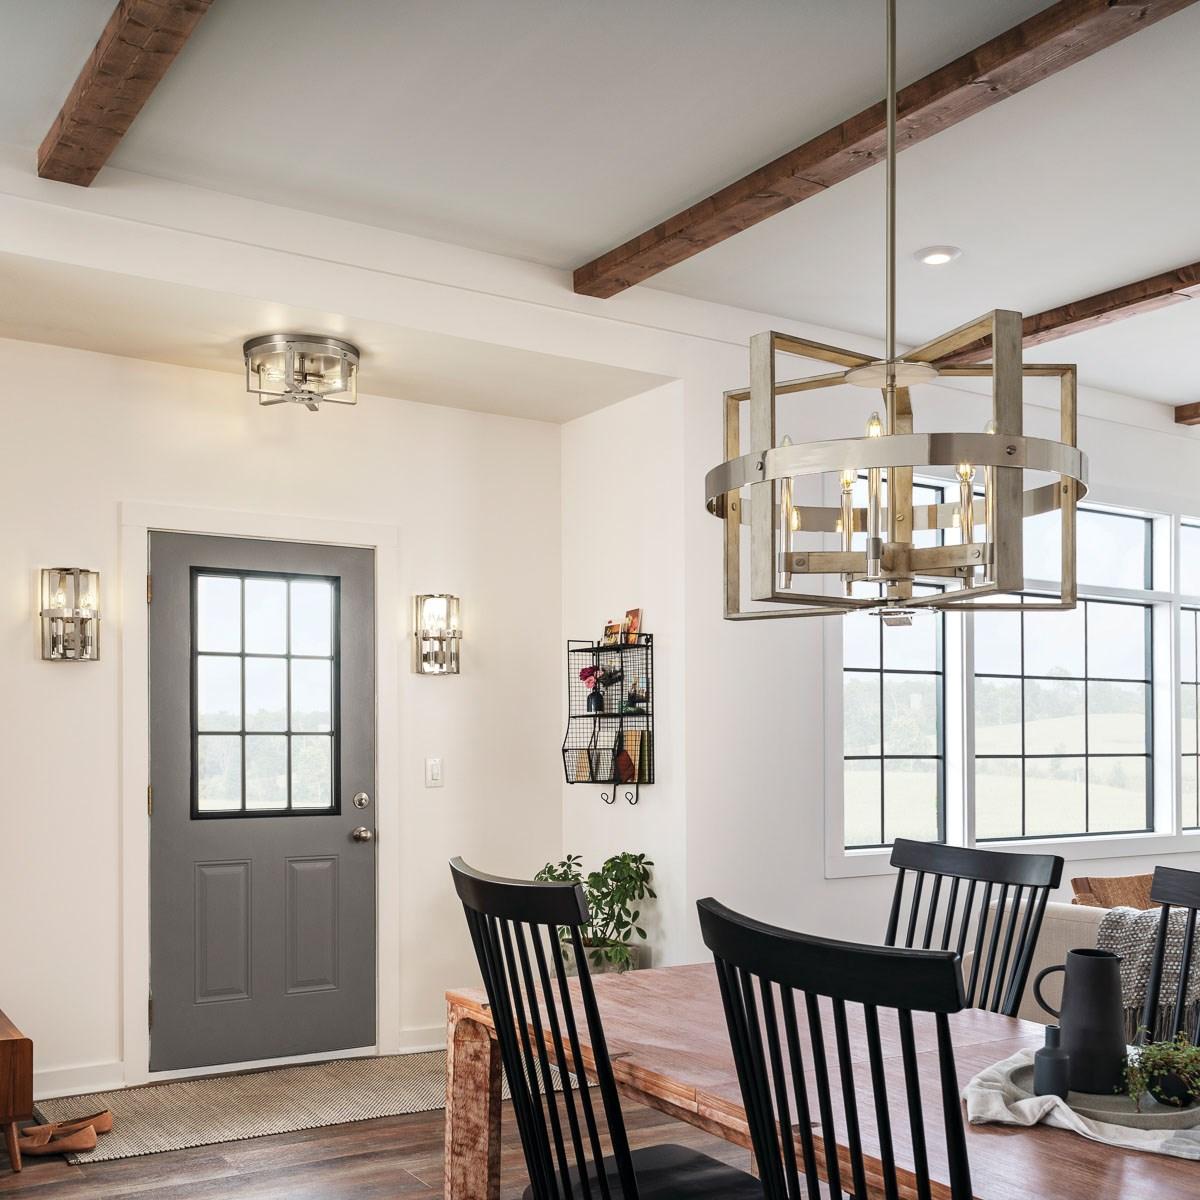 Peyton 2 Light Wall Sconce White Washed Wood | Kichler ... on Wood Wall Sconces Decorative Lighting id=54299